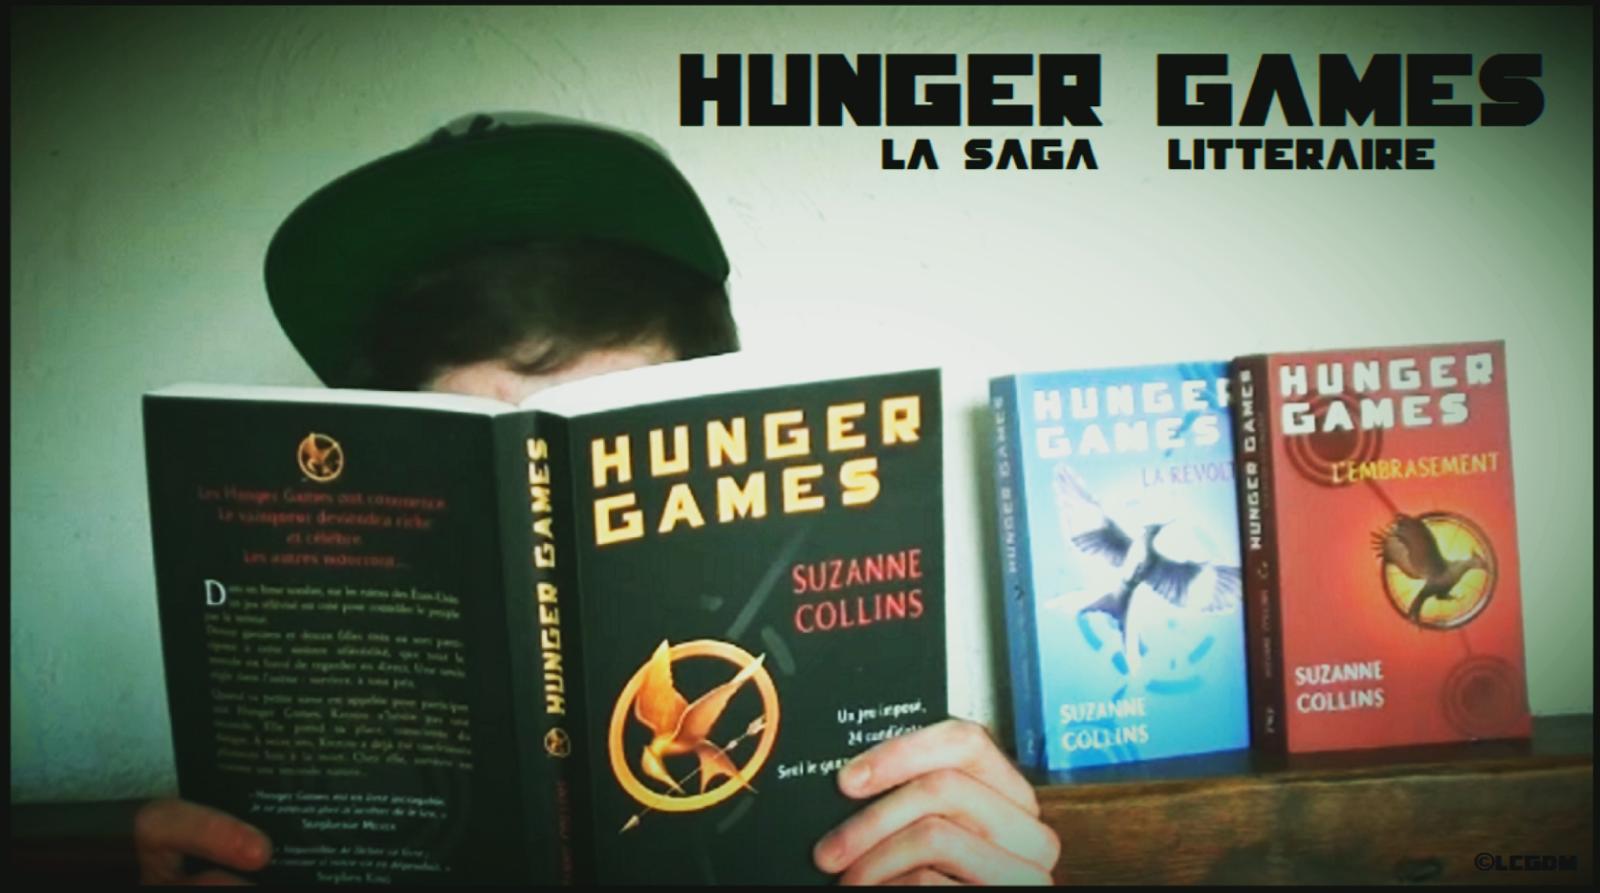 Hunger Games, la saga littéraire